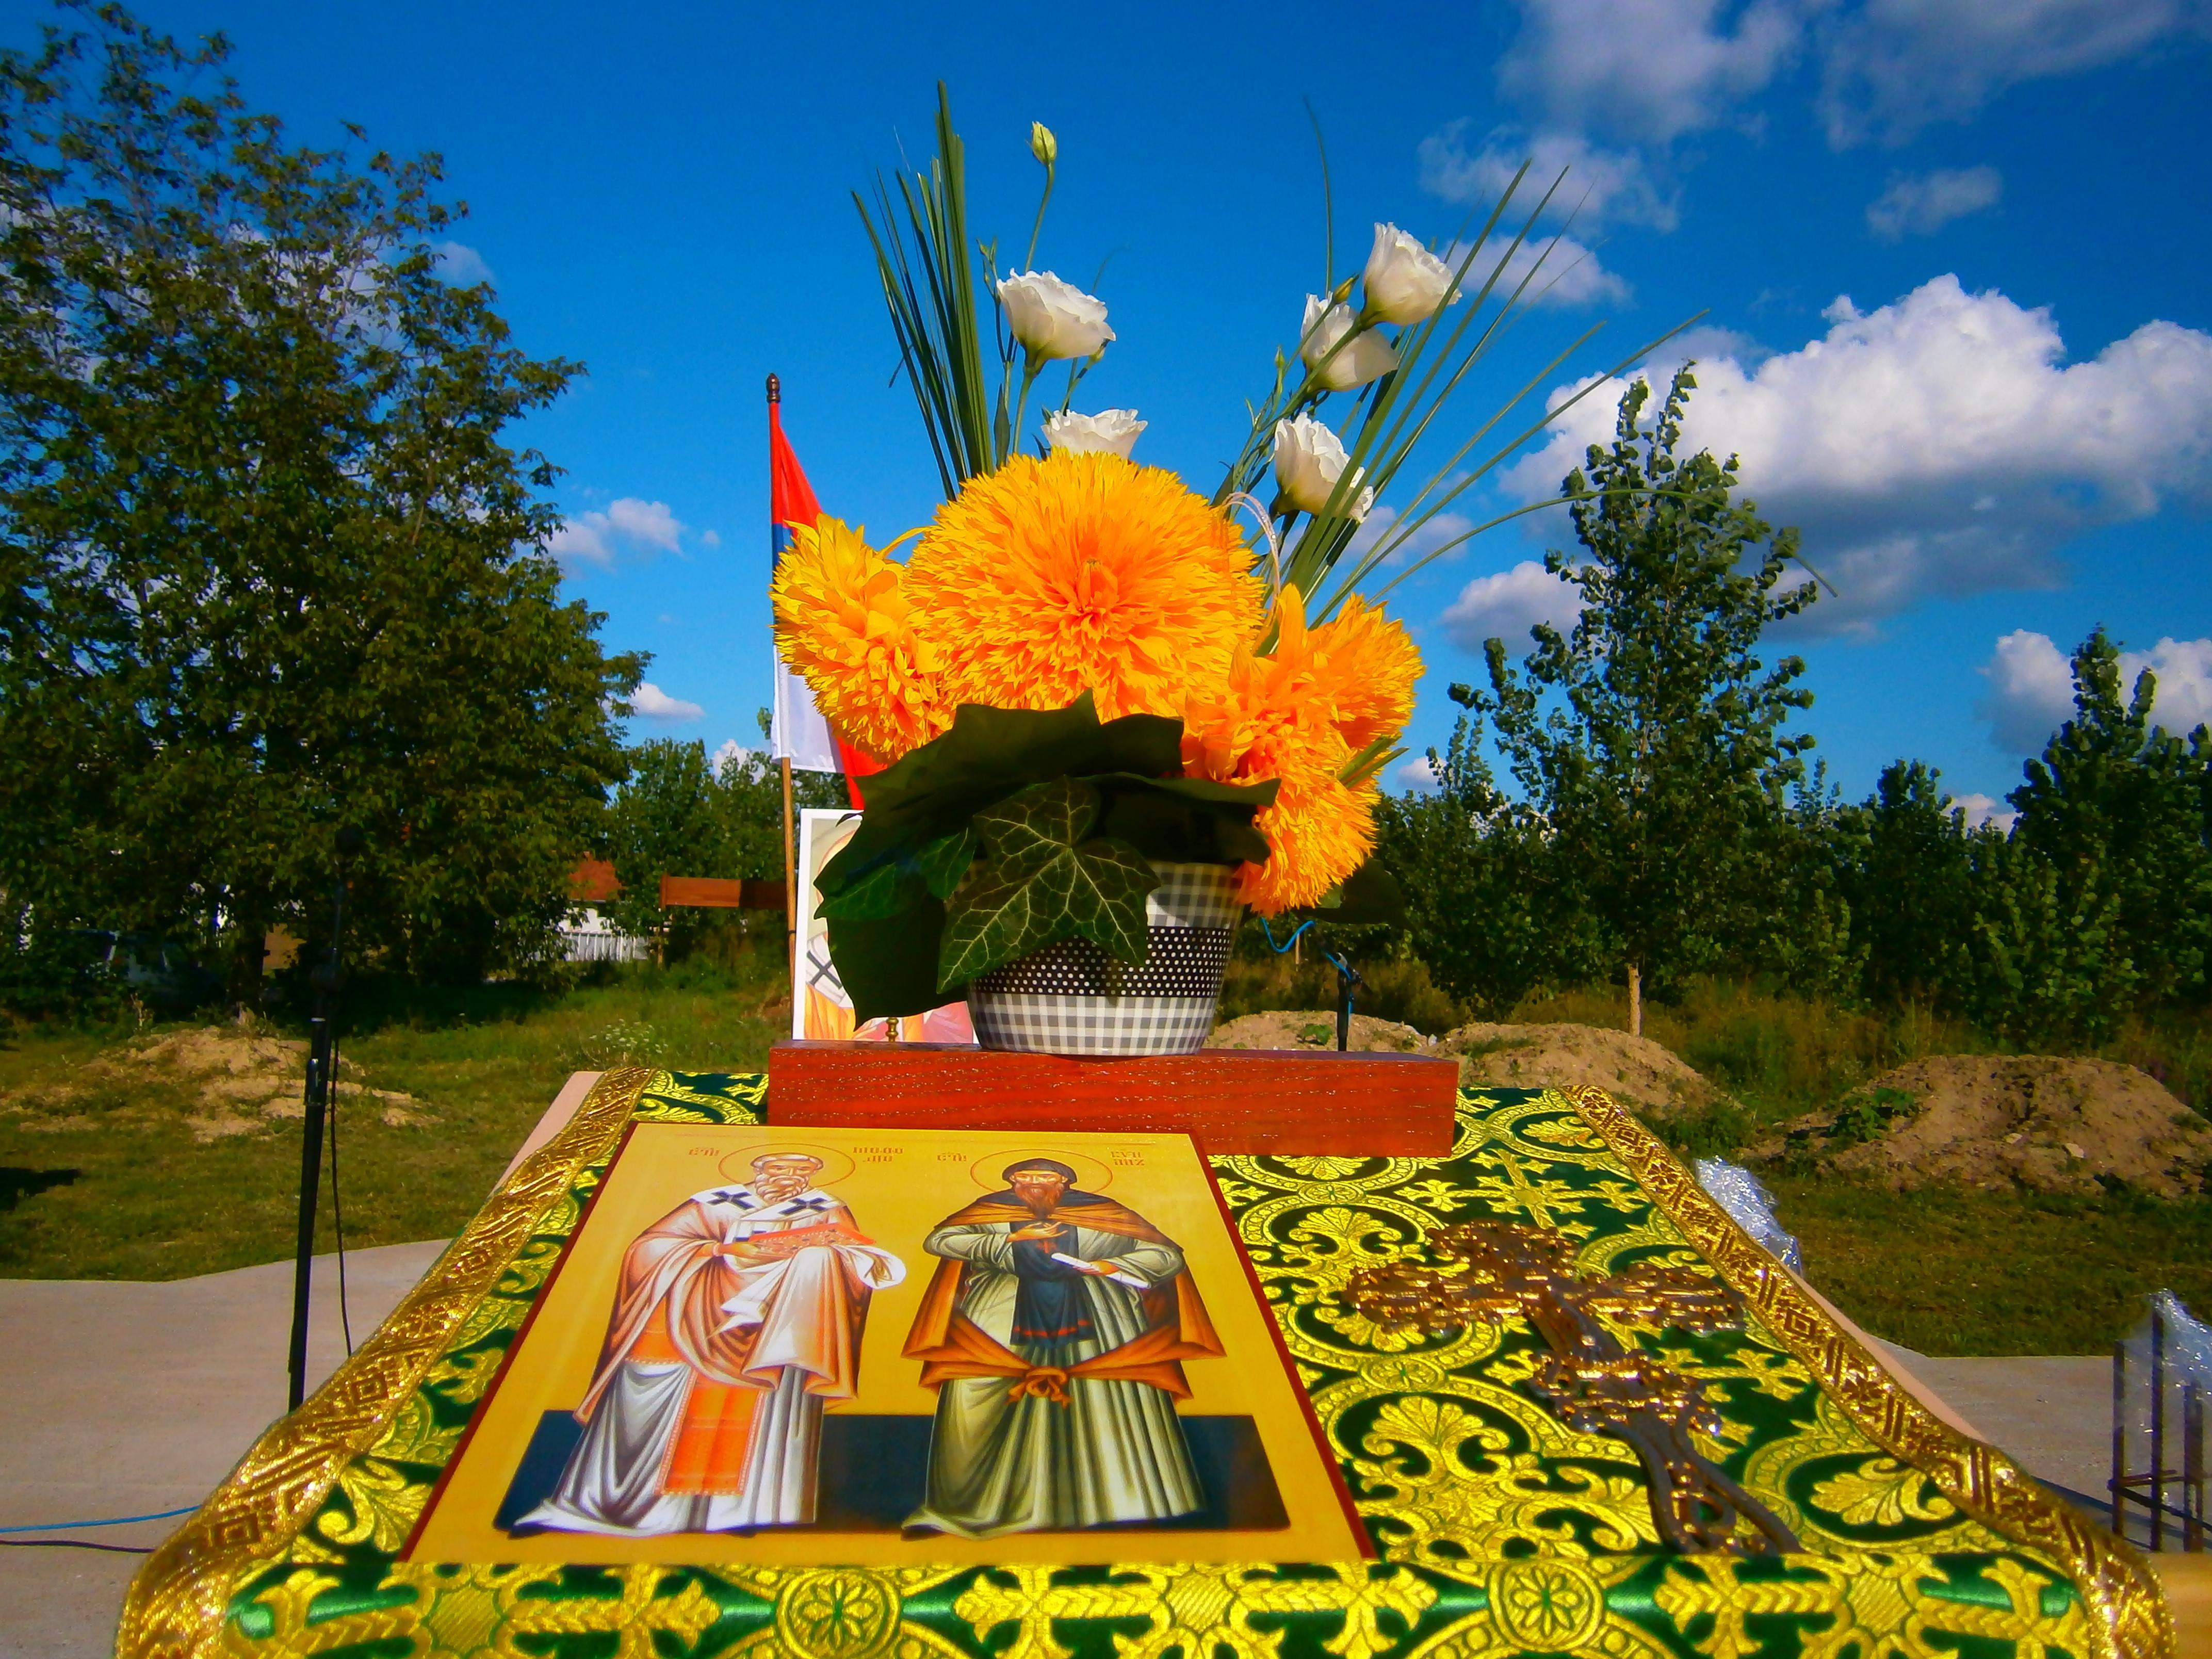 Молитва за наставак радова на изградњи храма Св. Кирила и Методија у Сремској Митровици